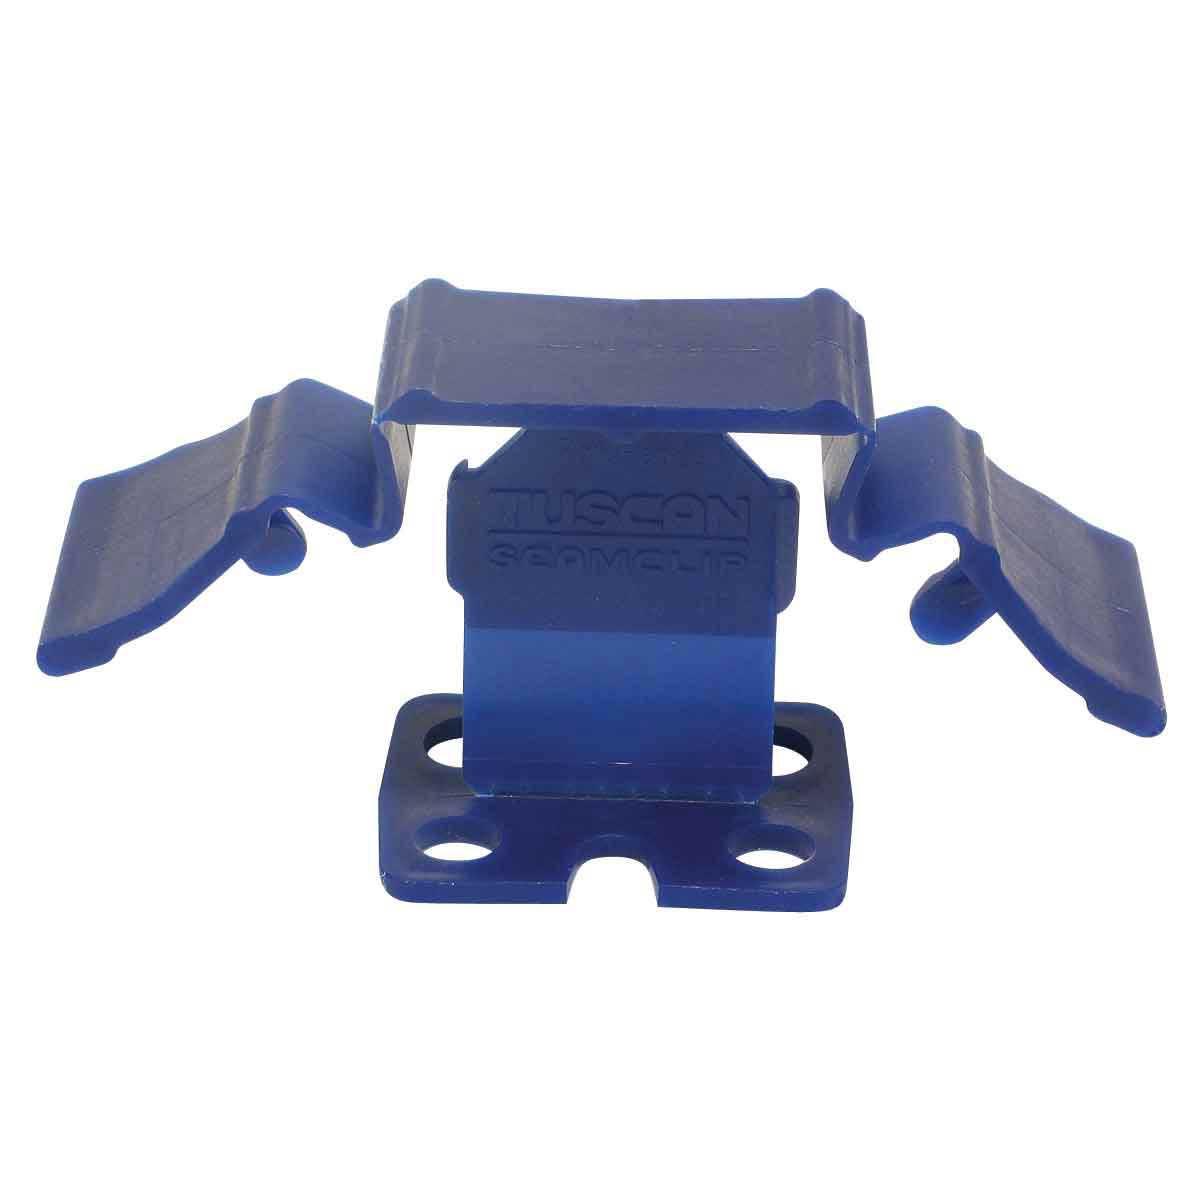 tuscan leveling seam clip blue